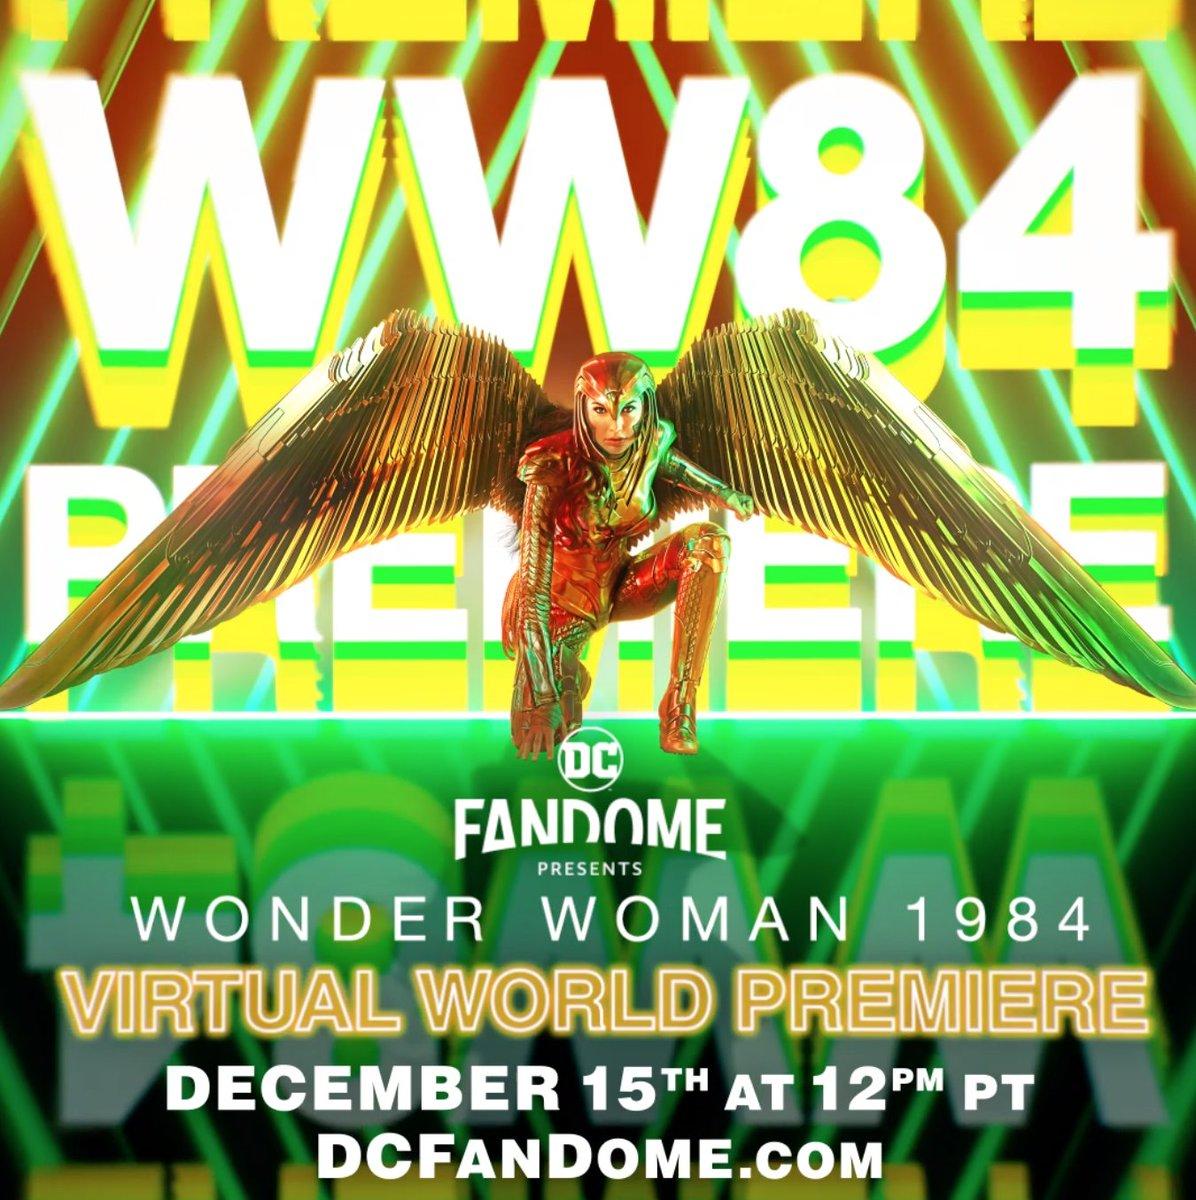 Wonder Woman 1984 on Twitter